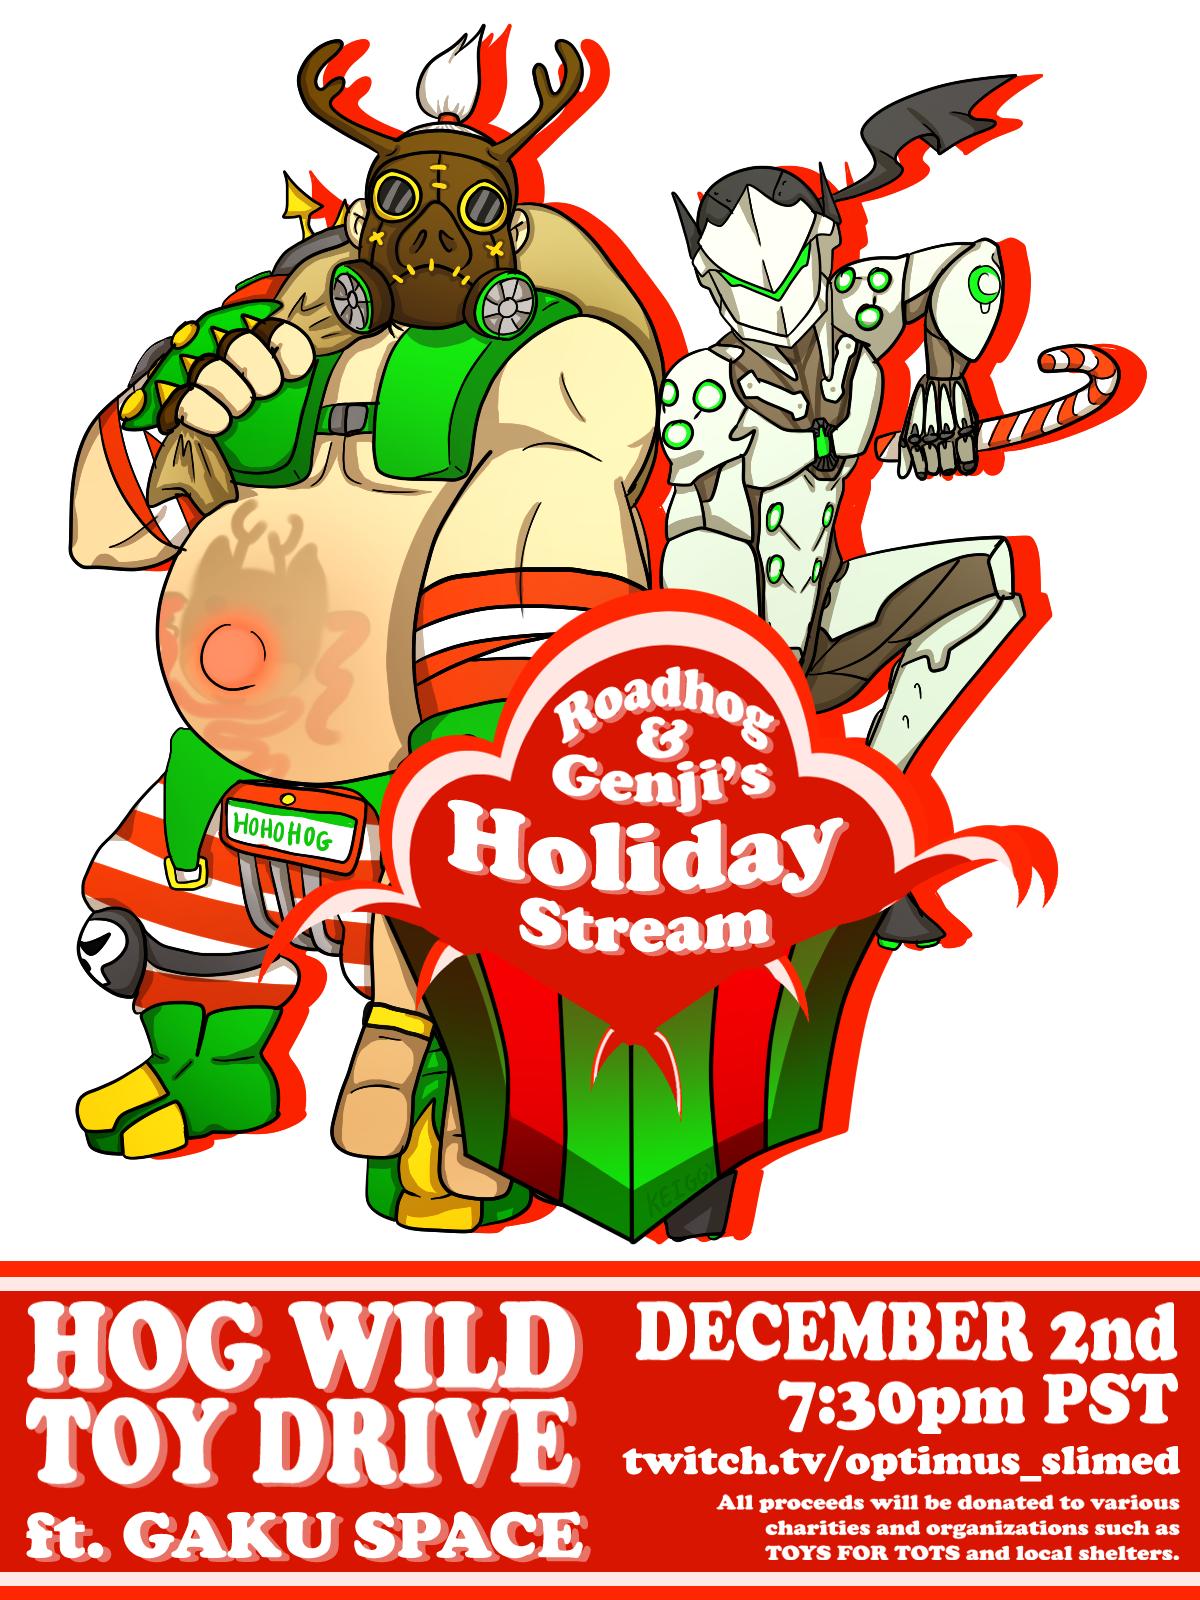 Roadhog & Genji's Holiday Stream (2017)